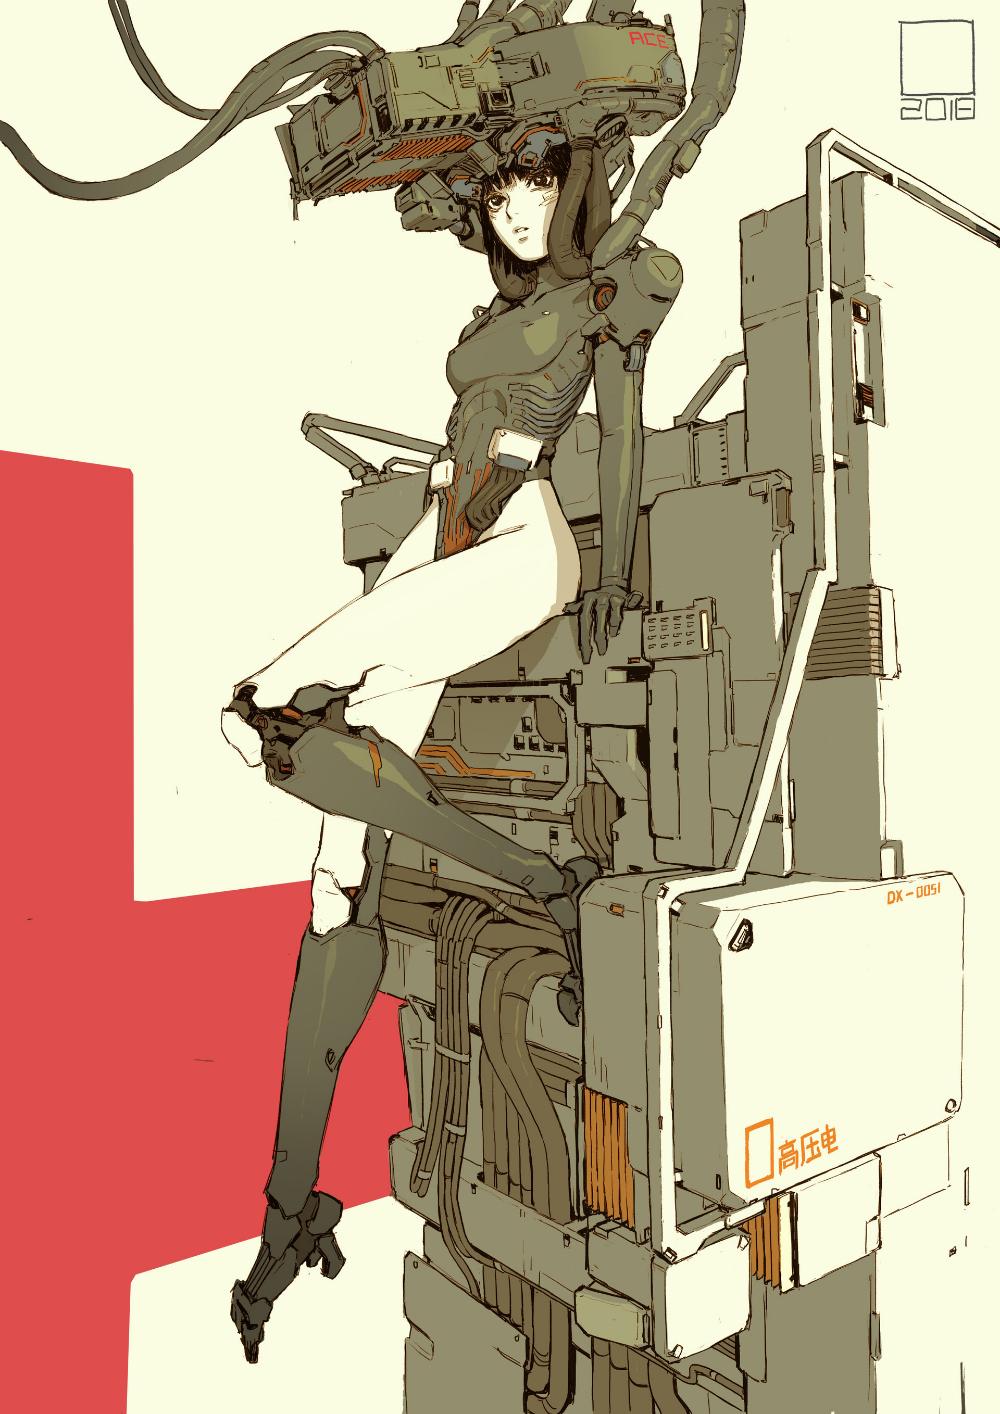 Pin by 민철 김 on 메카닉   Cyberpunk anime, Sci fi anime ...